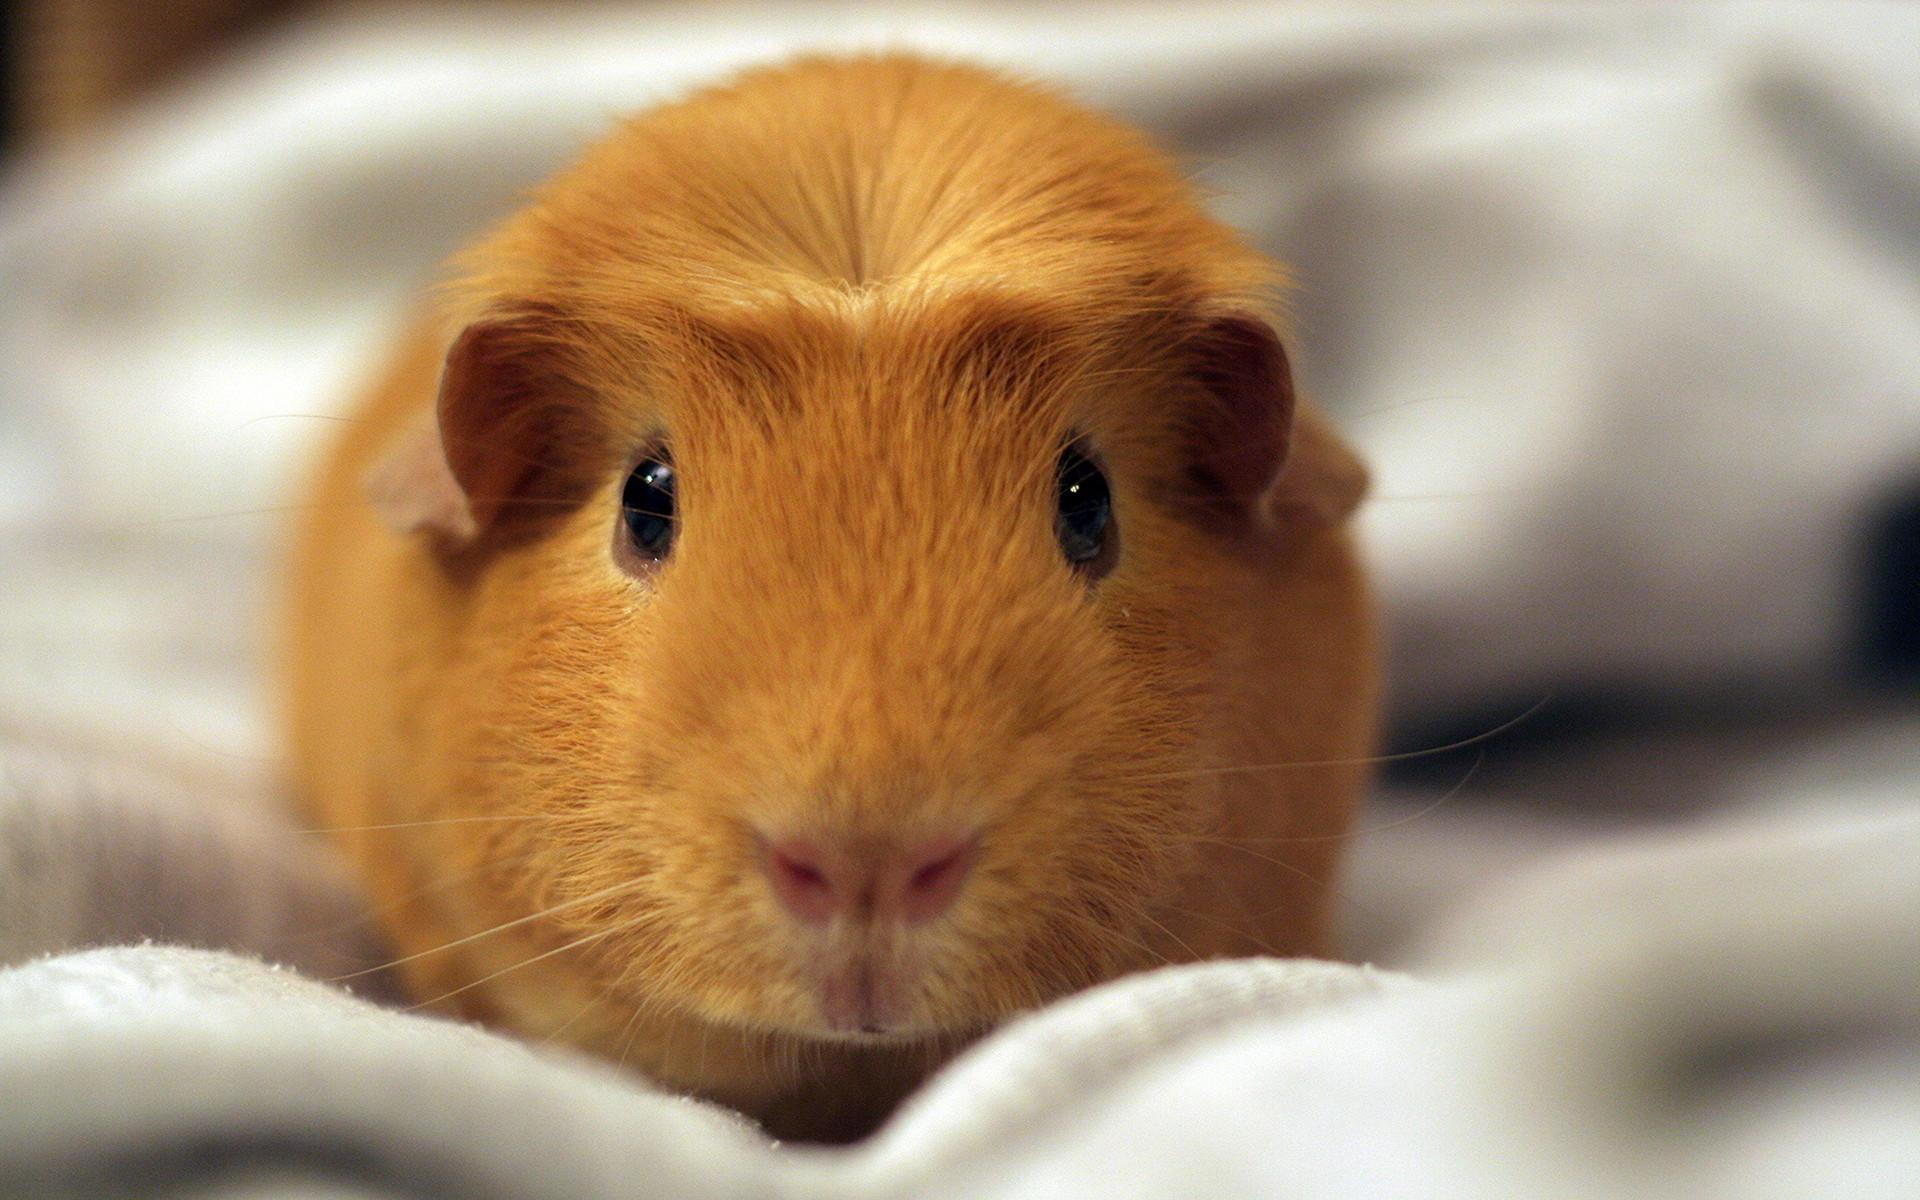 cute hamster wallpaper hot girl 1920x1200 1920x1200